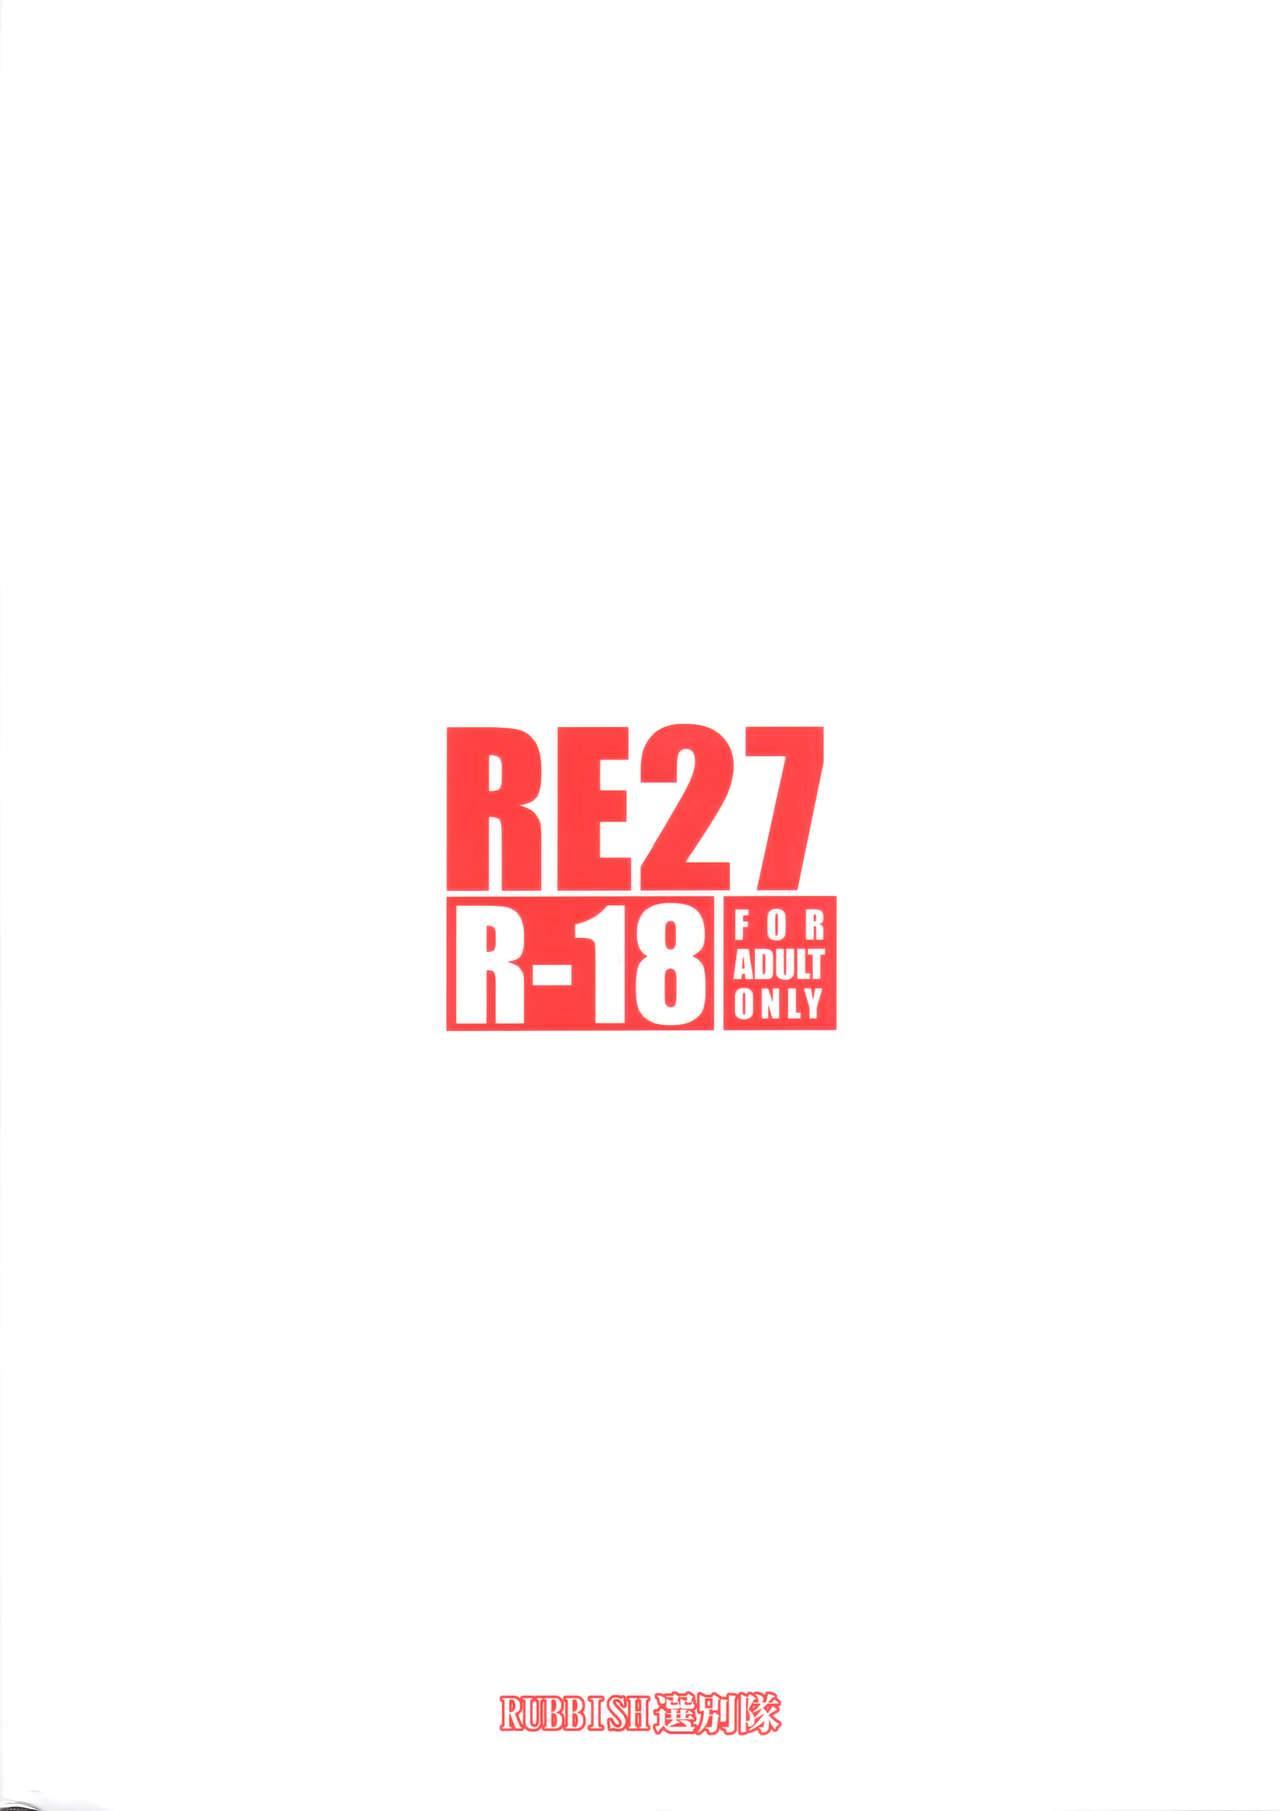 RE27 2